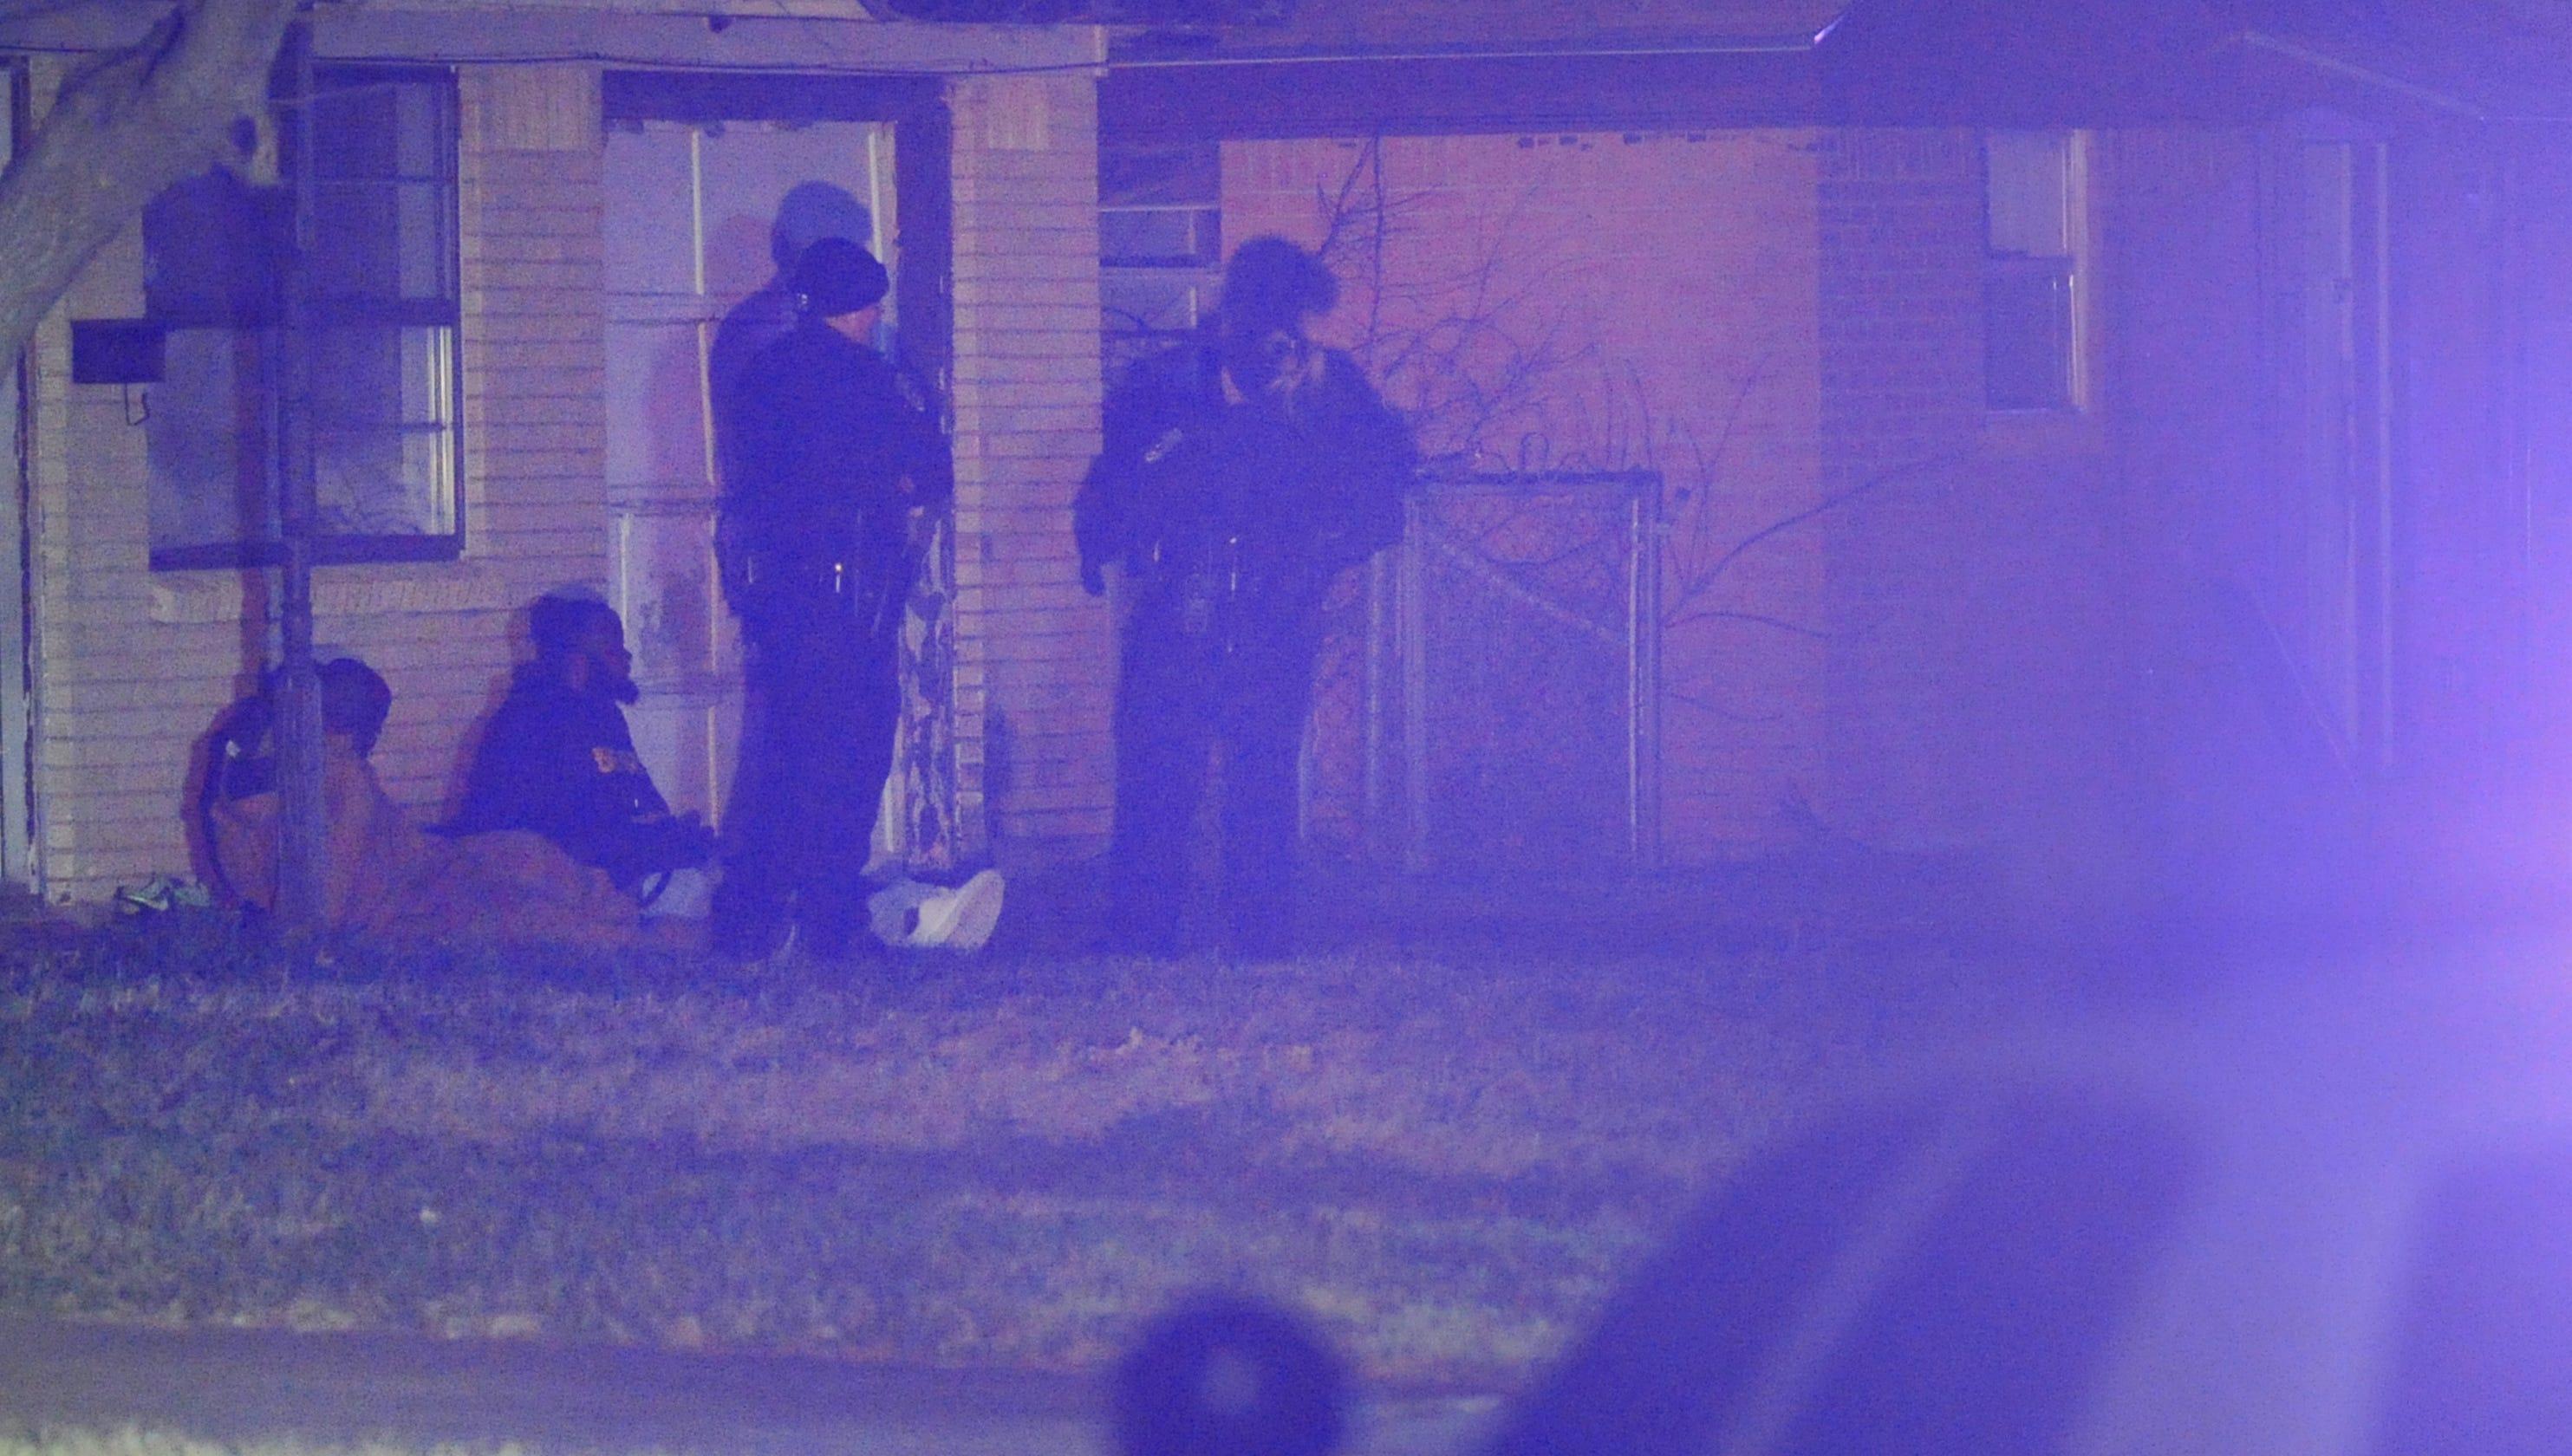 Wichita Falls PD: Man with warrant arrested following shots